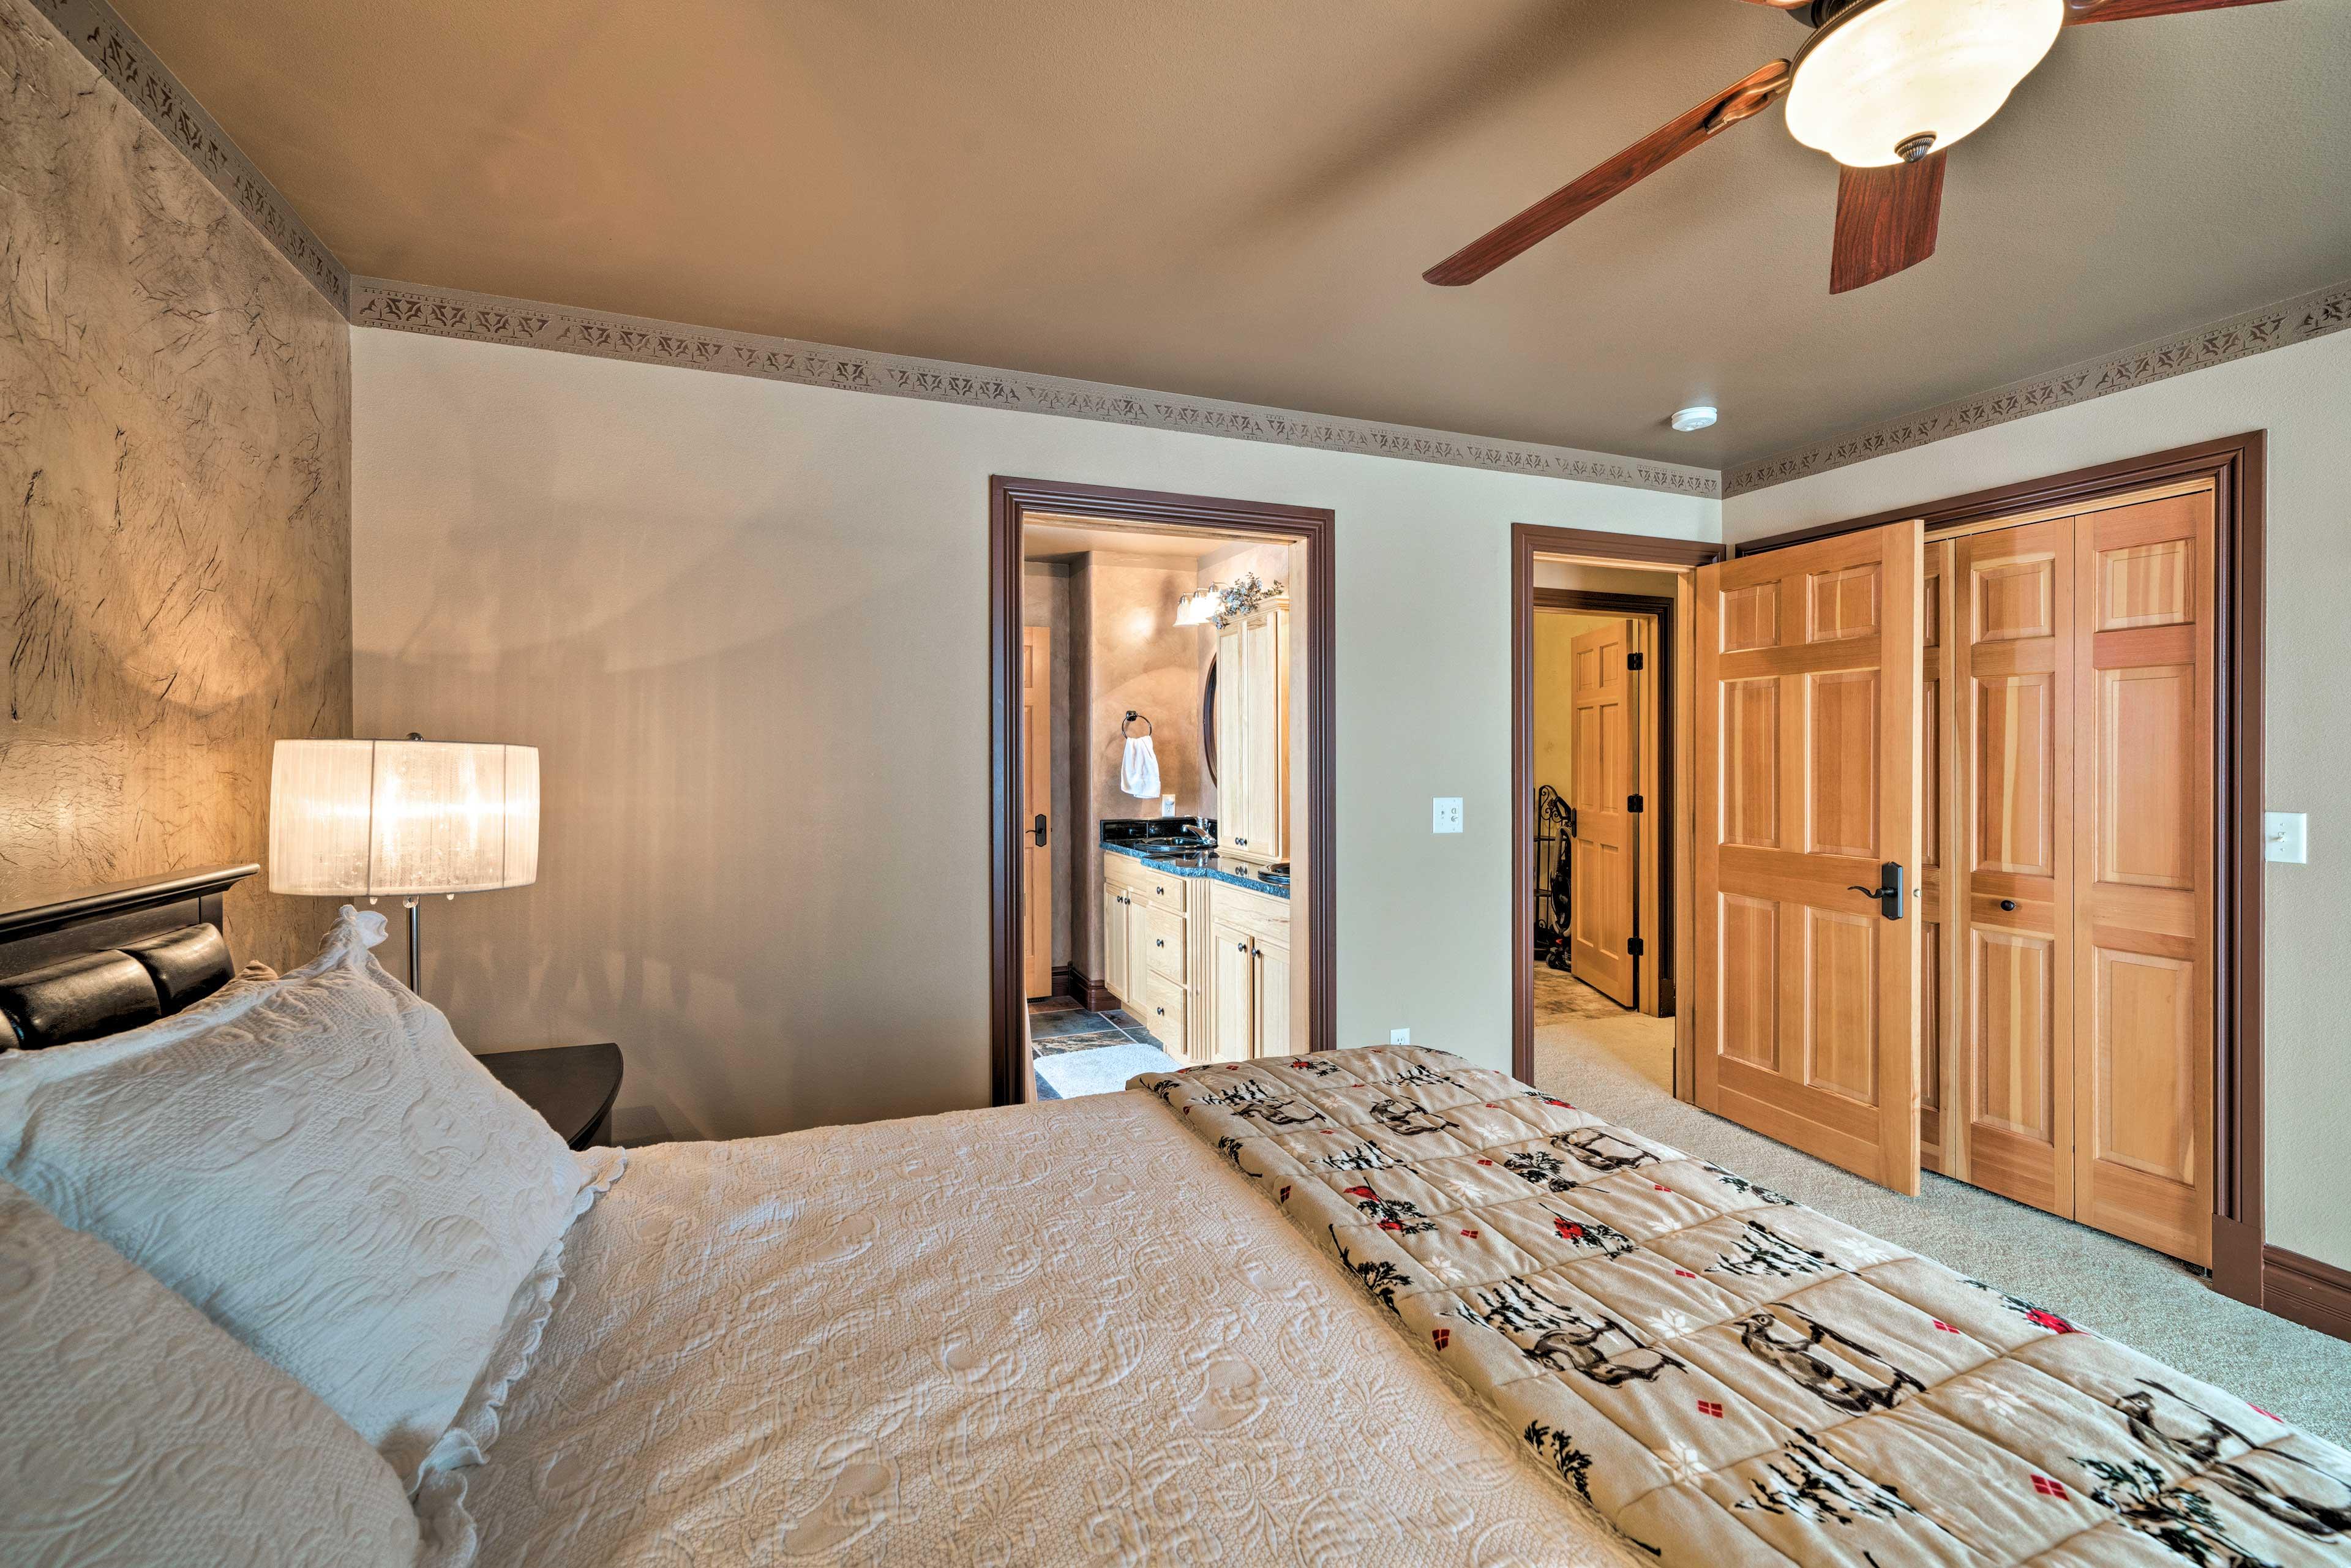 The first room has an en-suite bathroom!